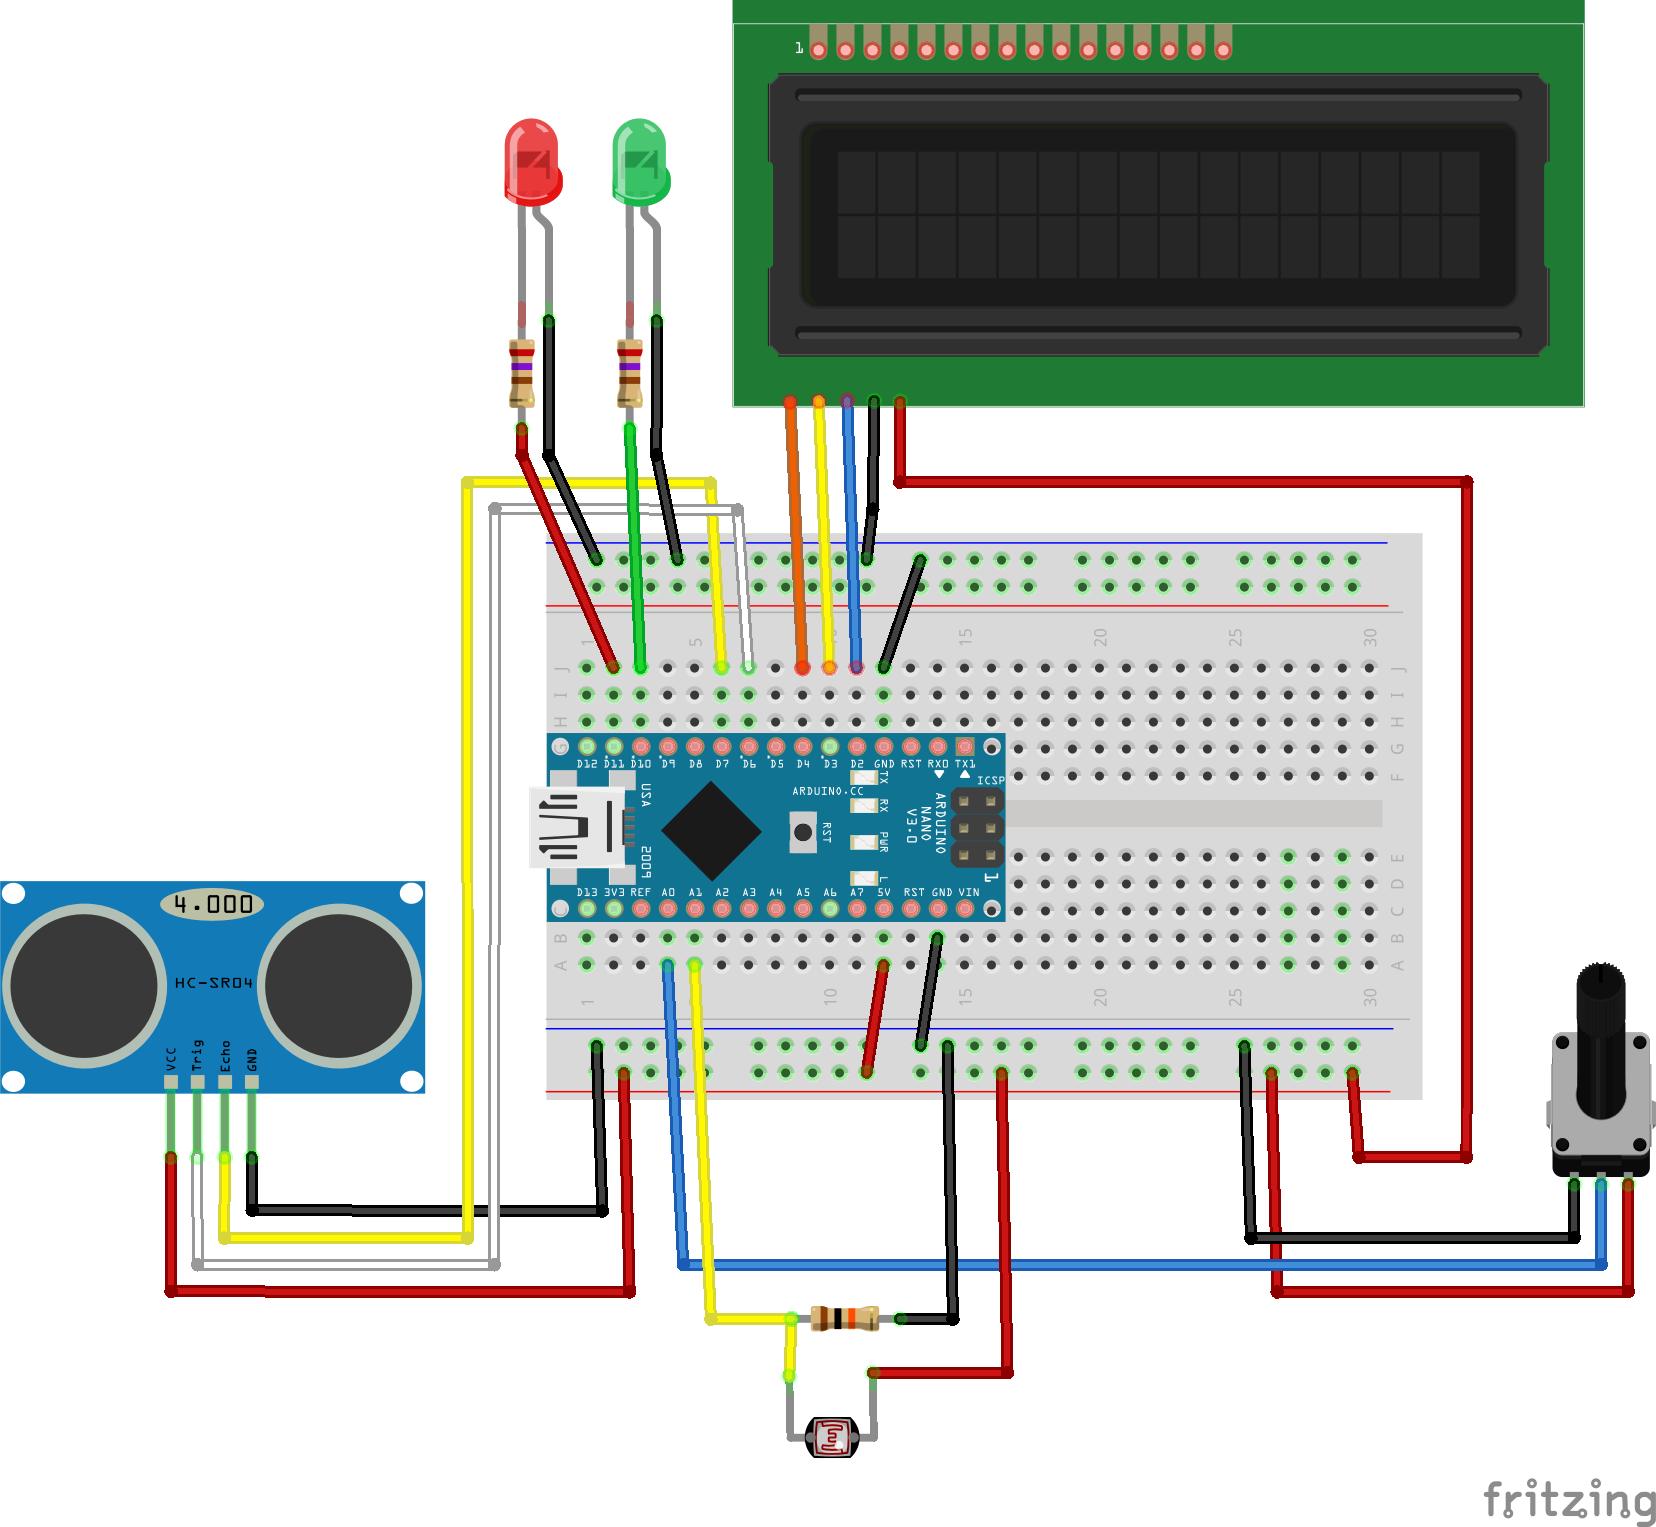 Wiringpi Ultrasonic Sensor Free Wiring Diagram For You Raspberry Pi Hc Sr04 Us 100 Arduino Diagrams Repair B Gpio Pinout Connecting